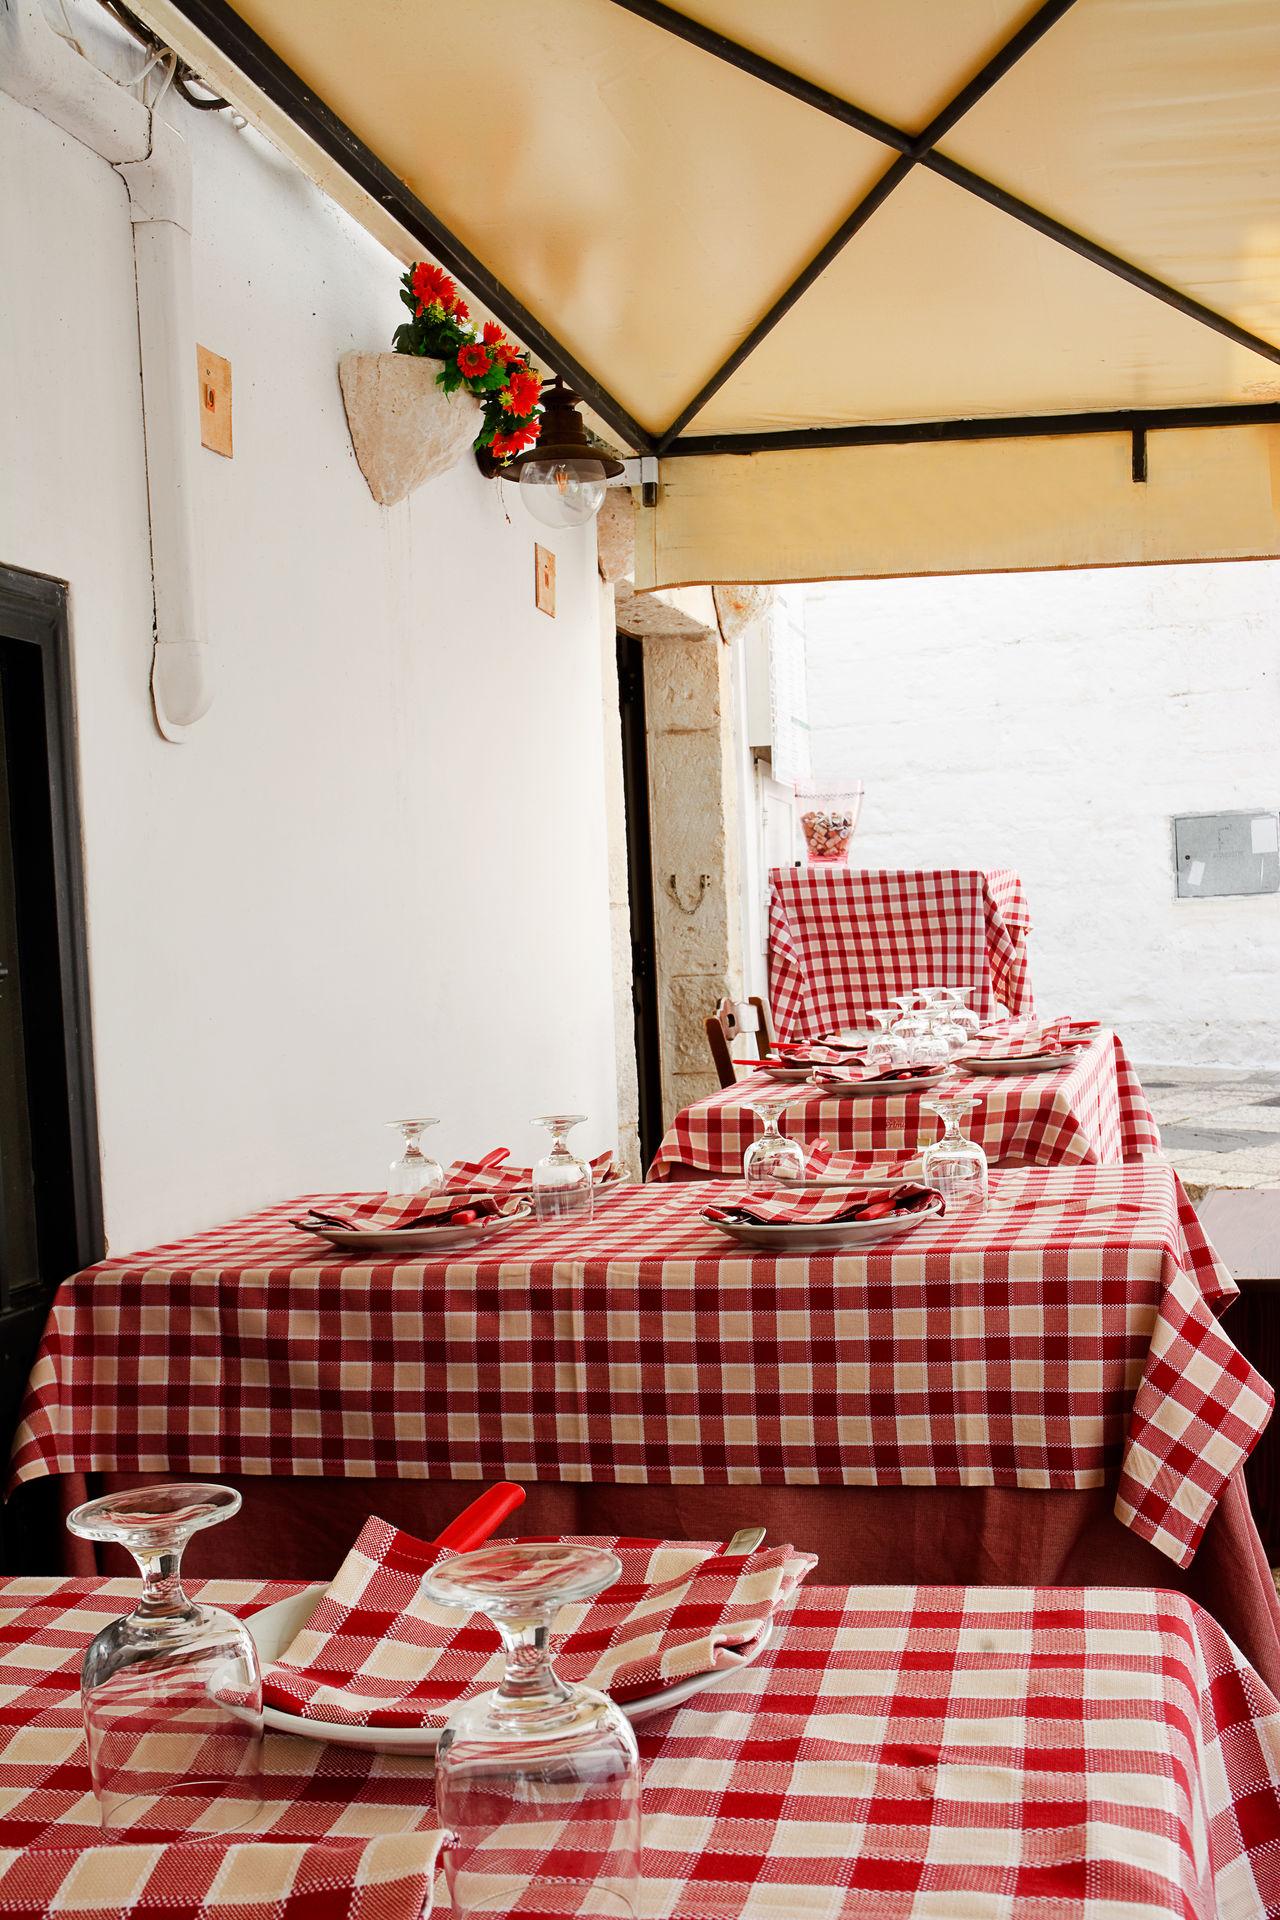 Table set in the alley of Cisternino (Apulia) Alley Apúlia Cisternino Cooker Dining Dinner Gazebo Glass Glasses Italy Itria Menu Napkin Ostuni Puglia Ready-to-eat Salento Set Table Tablecloth Tableware